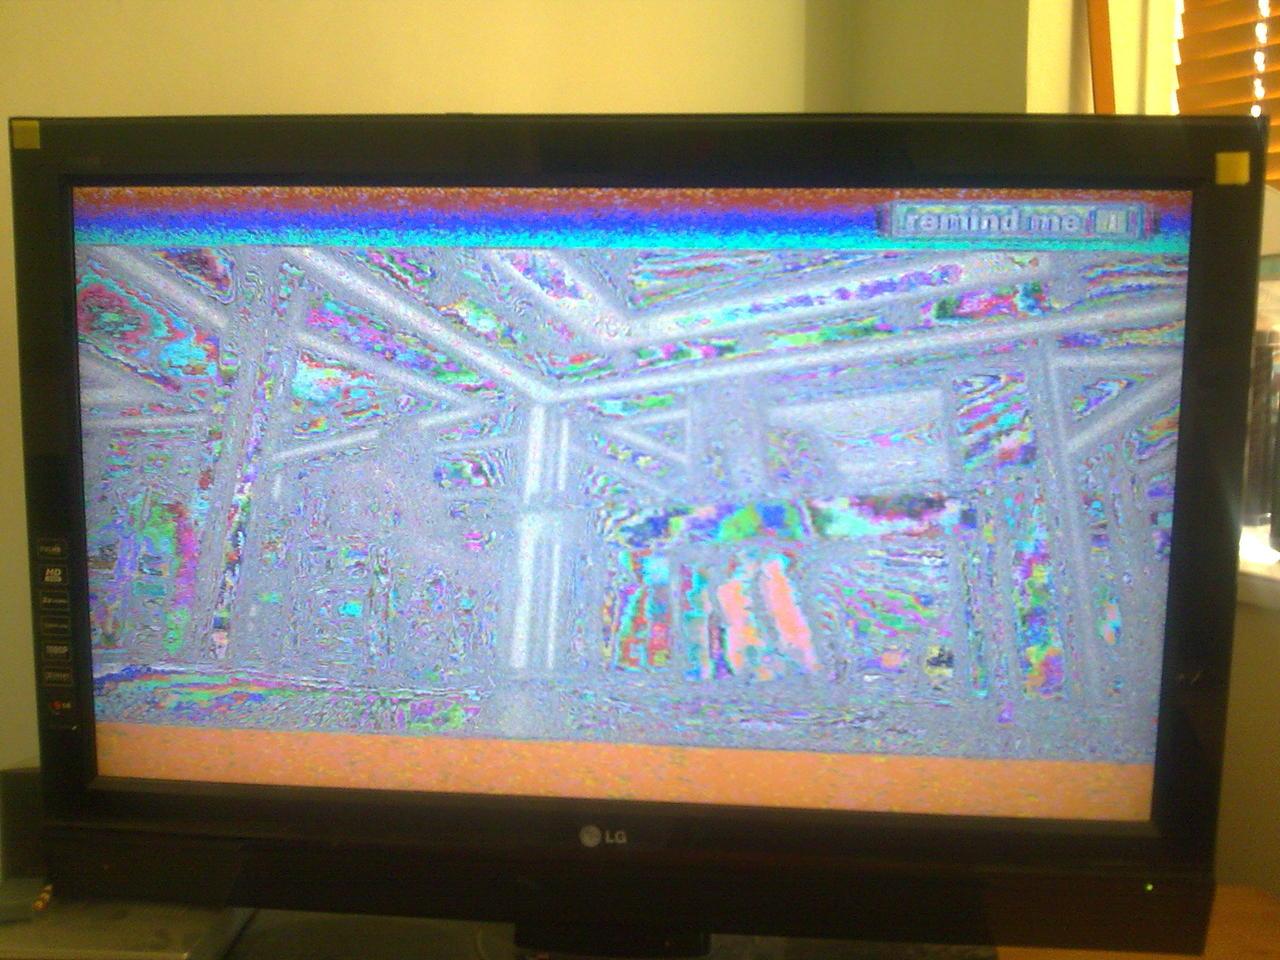 lg tv rare screen problems = baffled need advice | AVForums